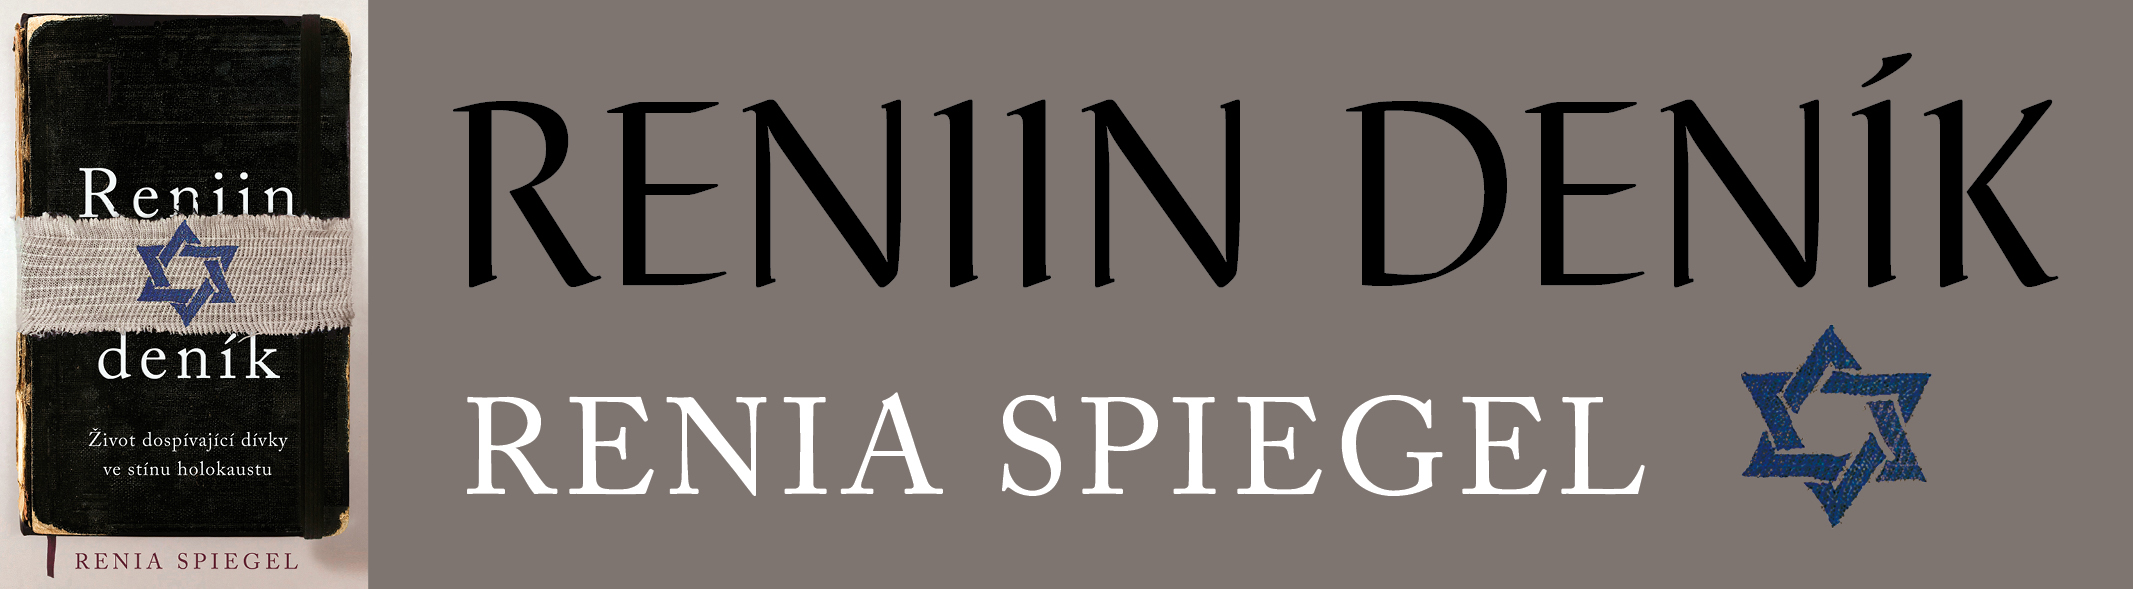 Renia Spiegel Reniin deník